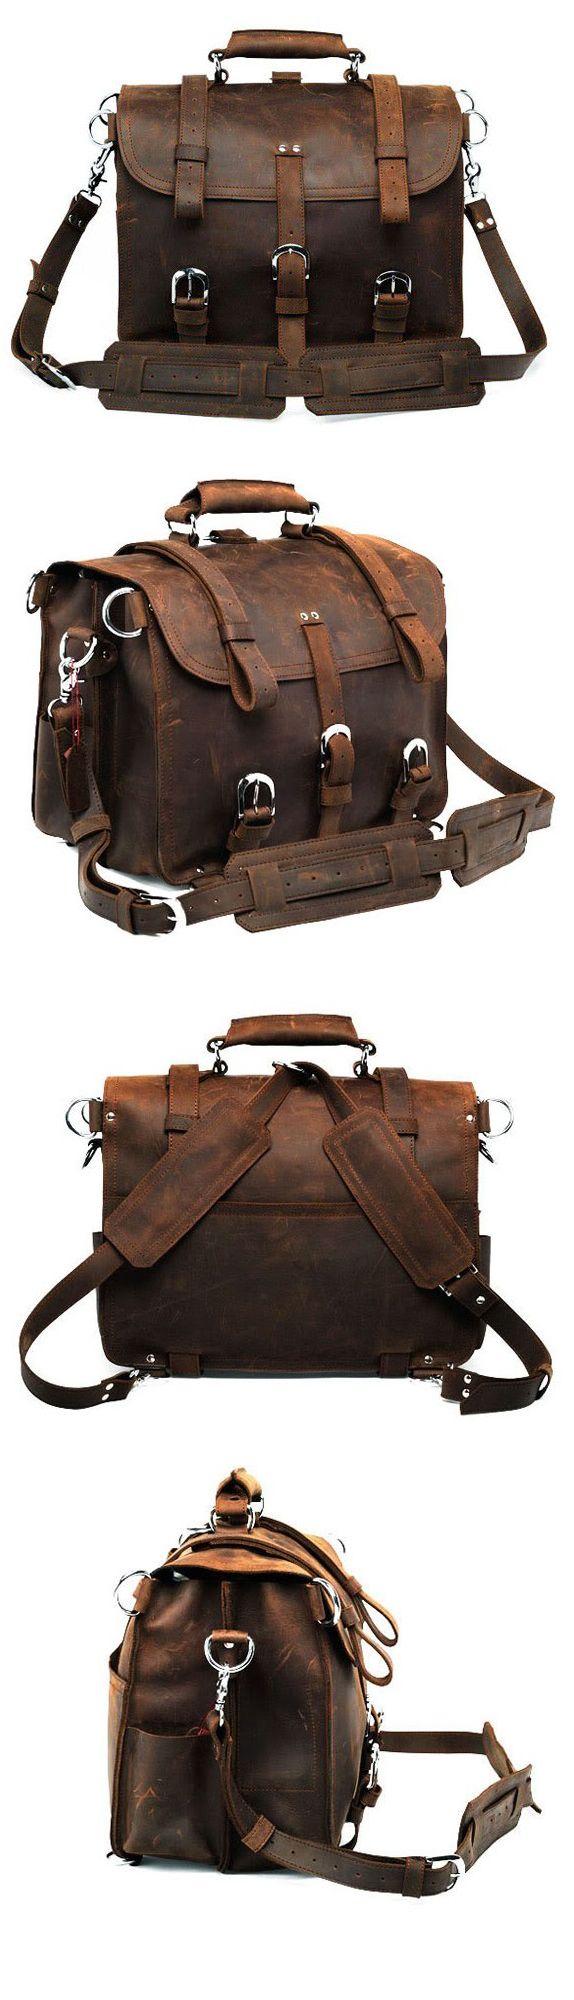 WOW Arrogance Vintage Classic Crazy Horse Leather Briefcase Handbag/Backpack/Travel Bag/Laptop Bag/Travel Duffle Bag